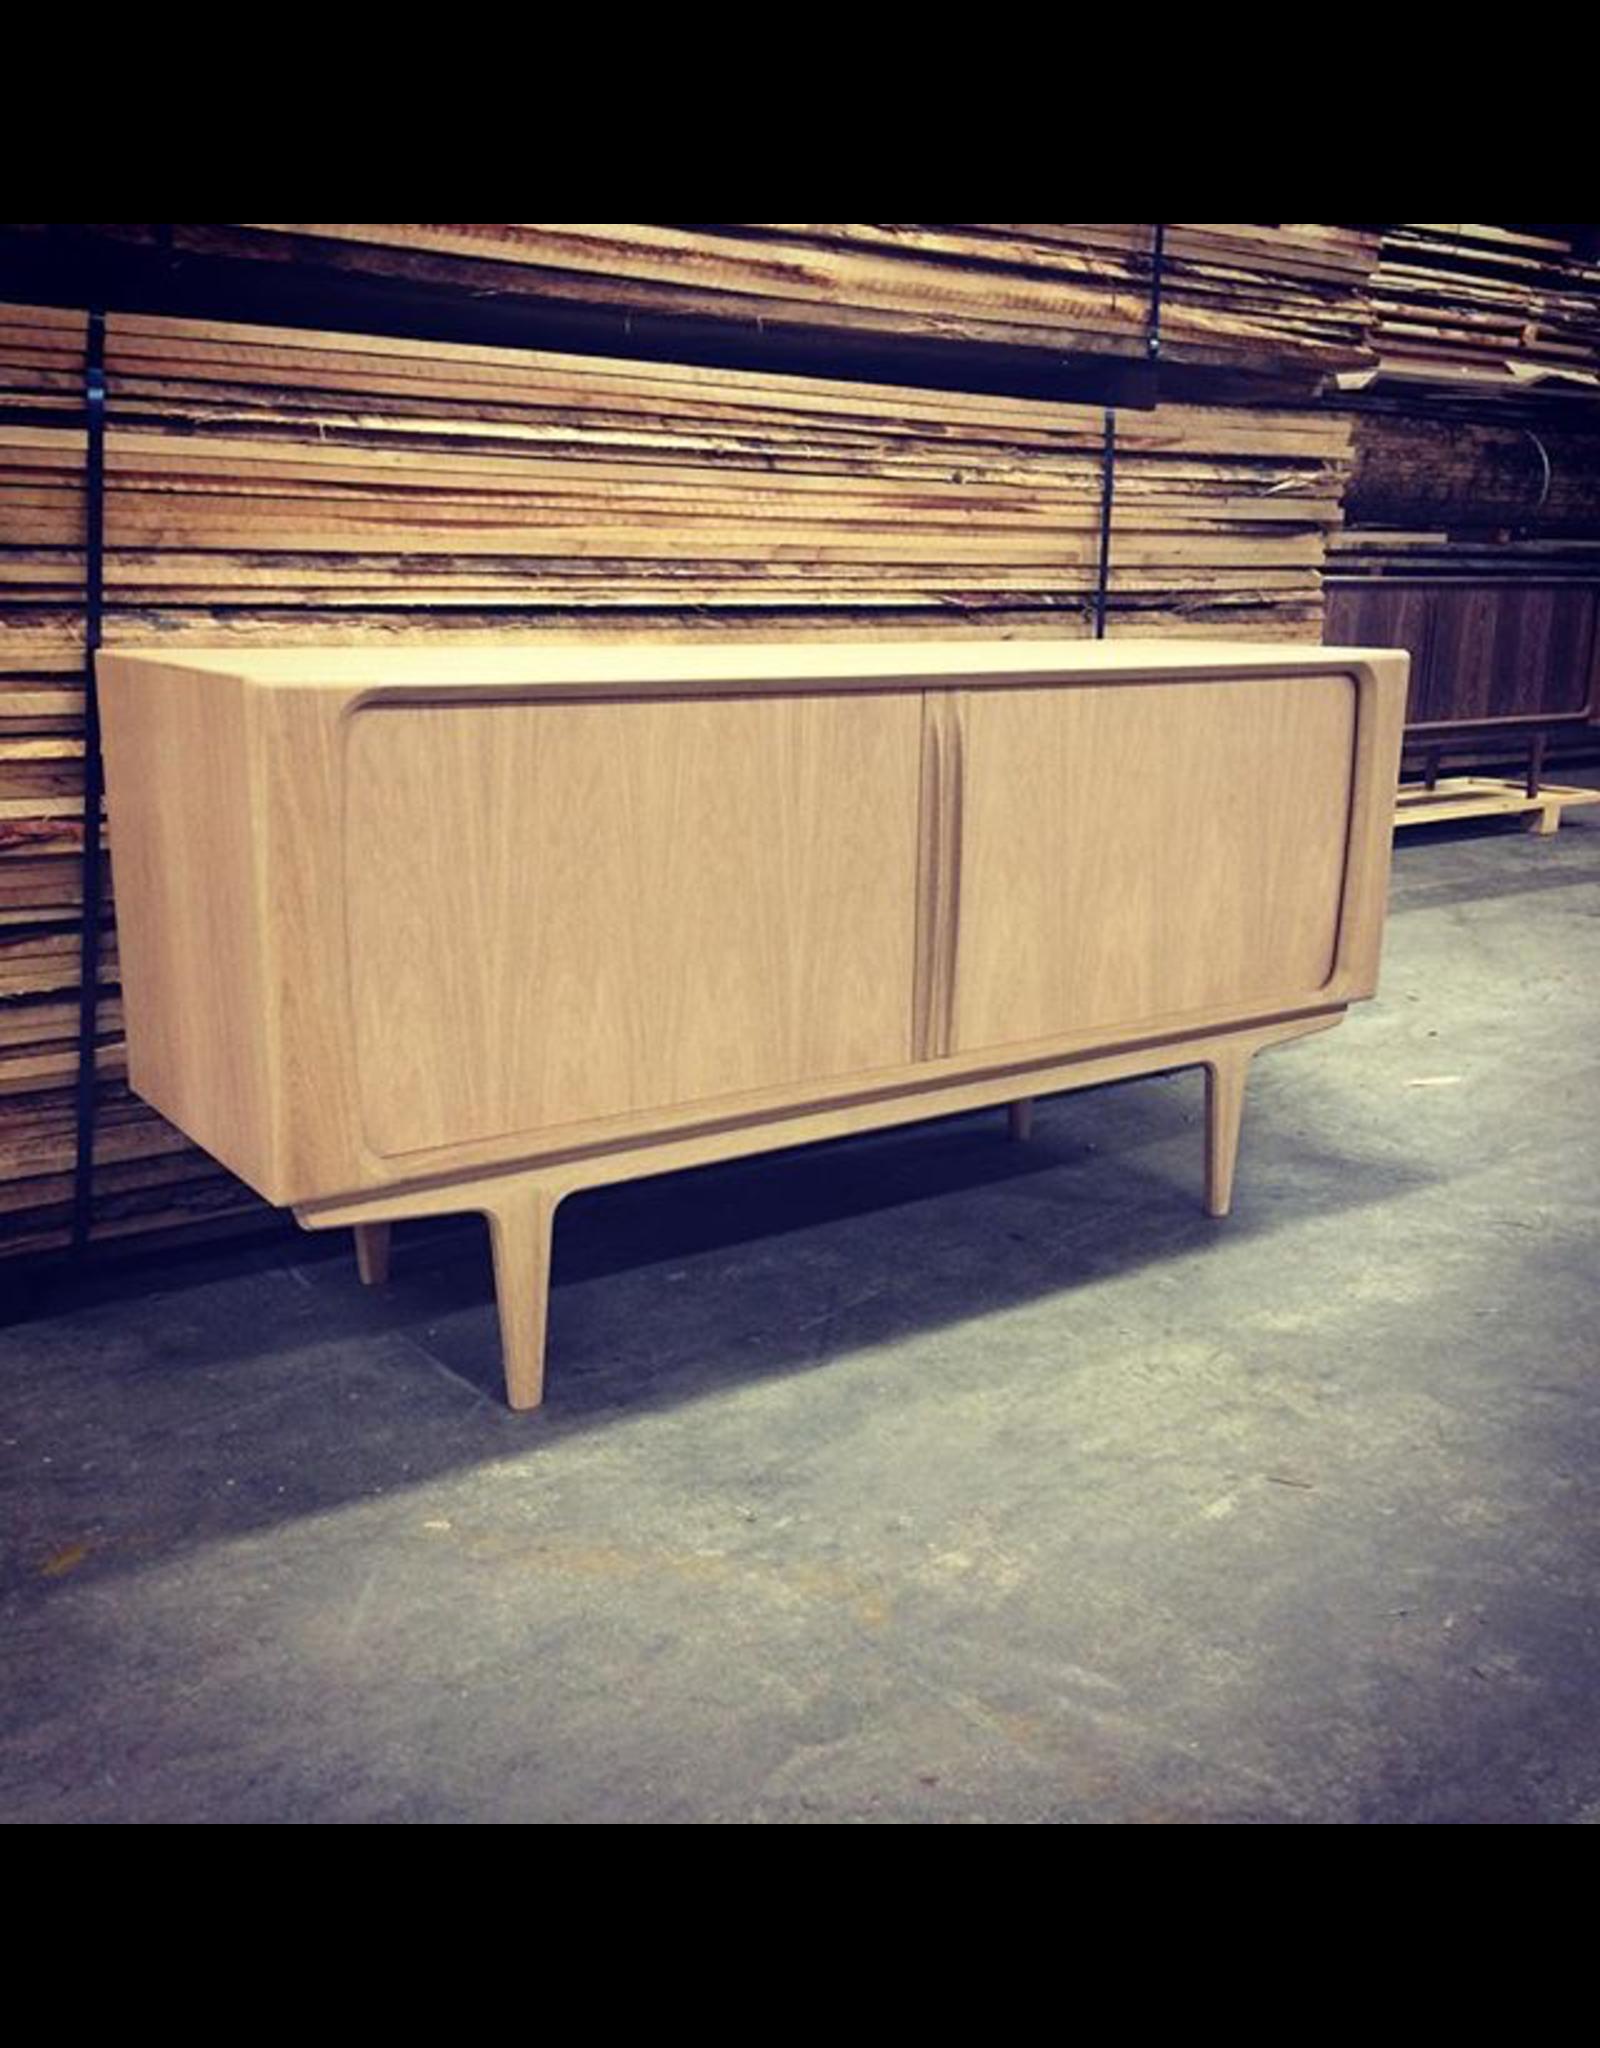 142 SIDEBOARD 165厘米寬餐邊櫃